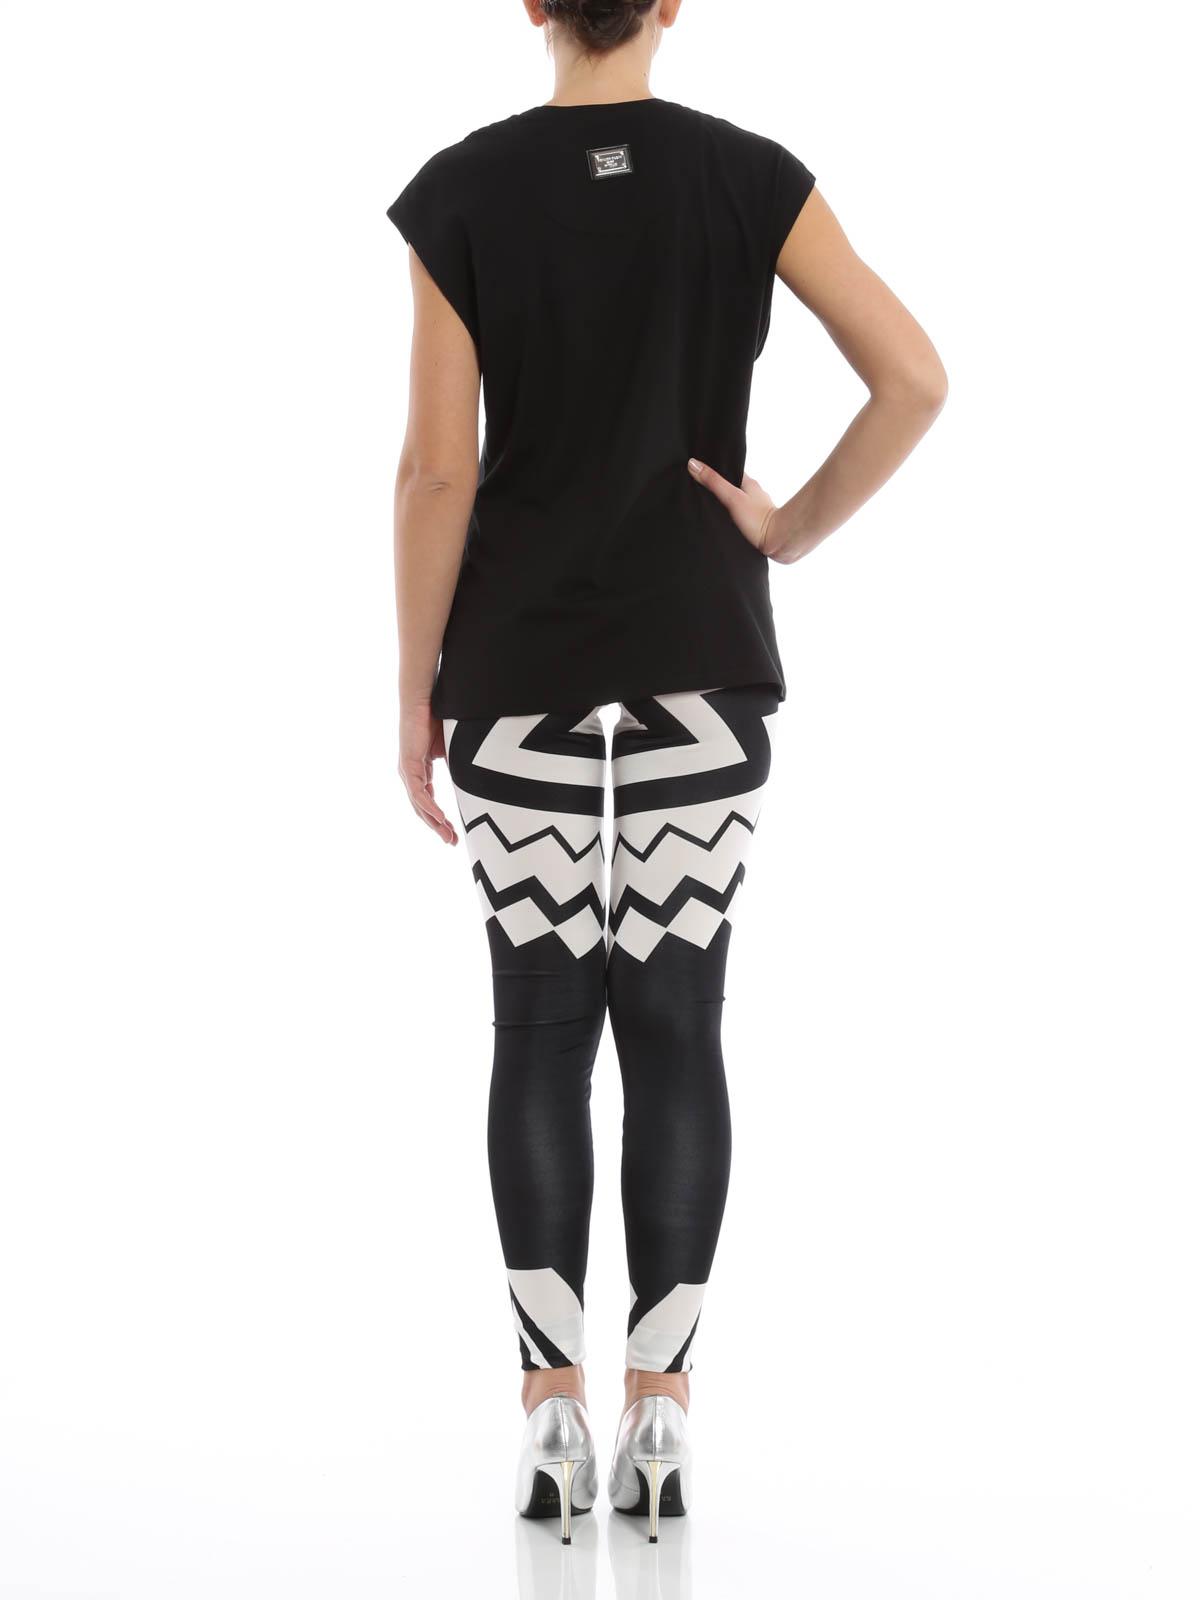 t shirt brooklyn in cotone philipp plein t shirt ikrix shop online cw345007 02. Black Bedroom Furniture Sets. Home Design Ideas